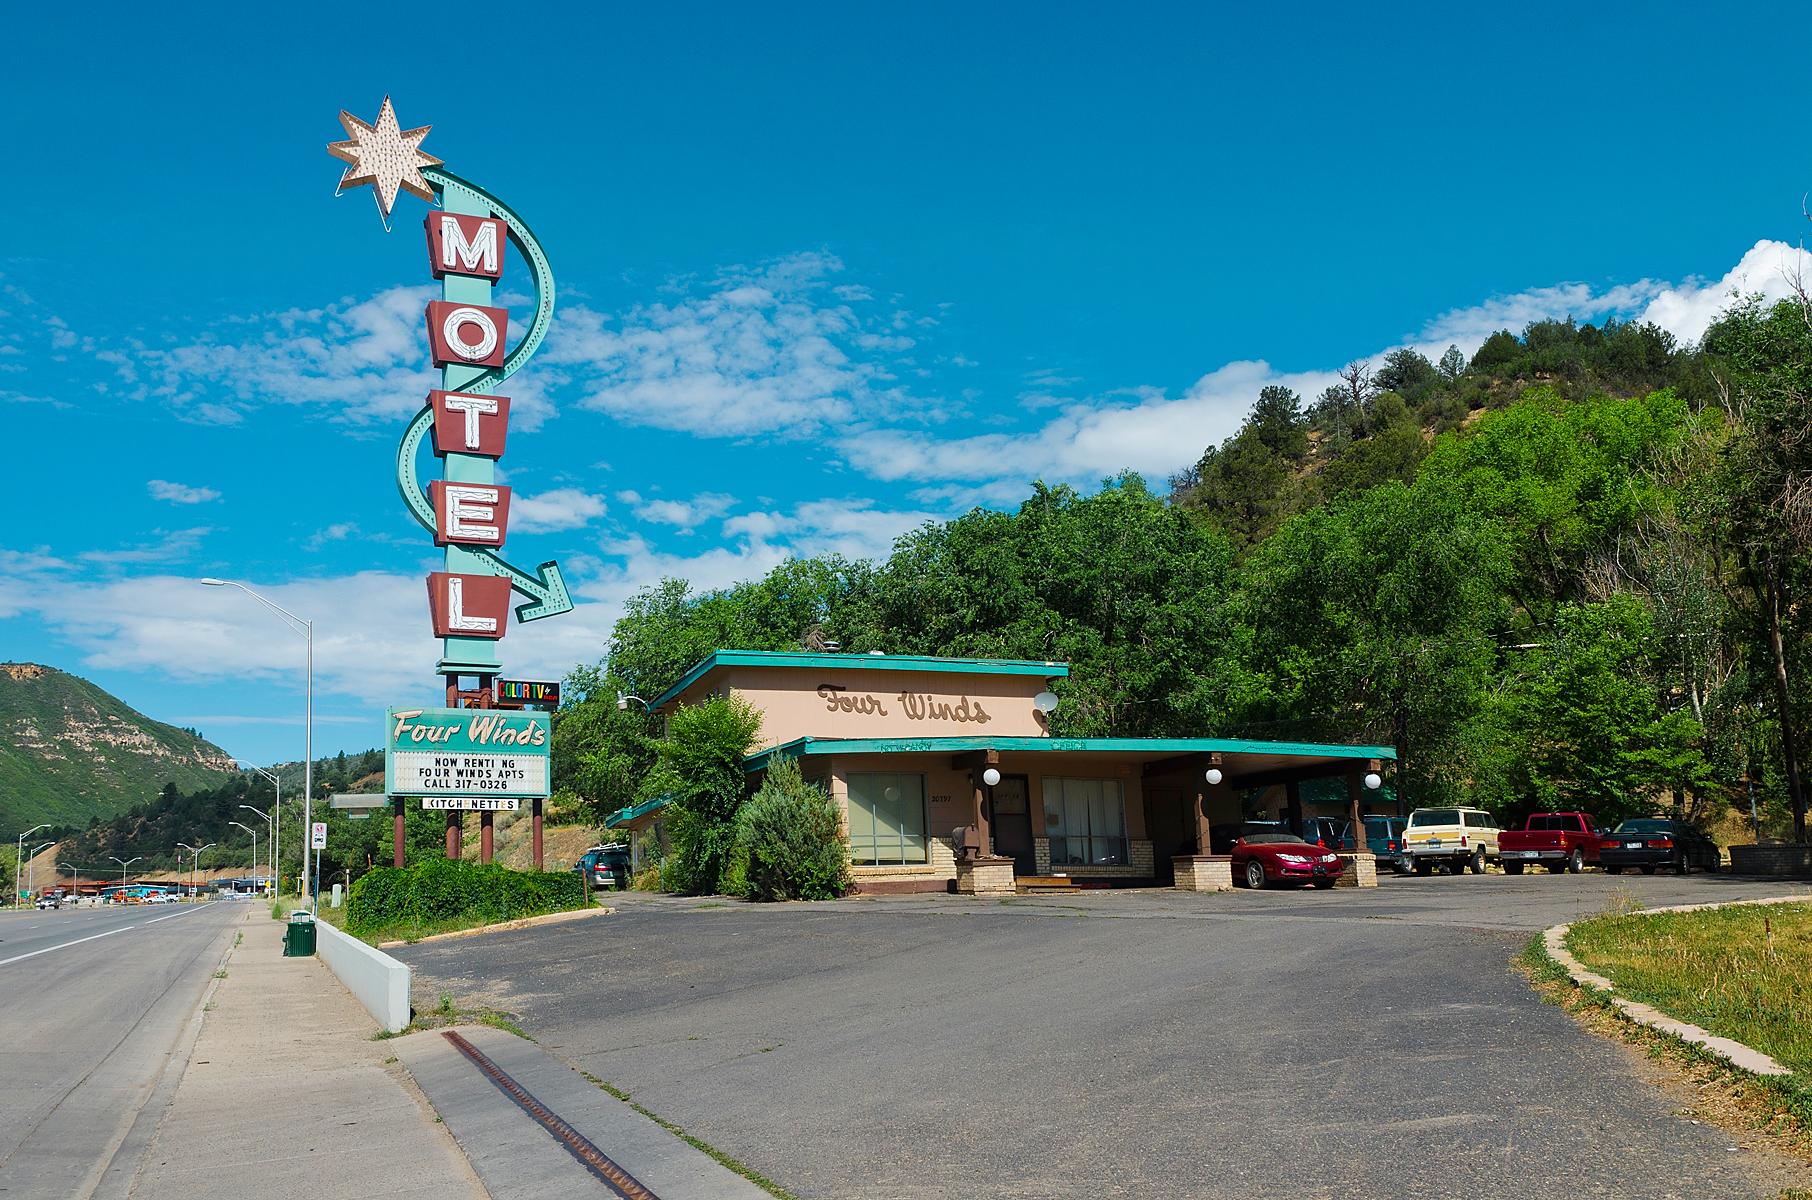 Four Winds Motel - 20797 U.S. 160, Durango, Colorado U.S.A. - July 14, 2013